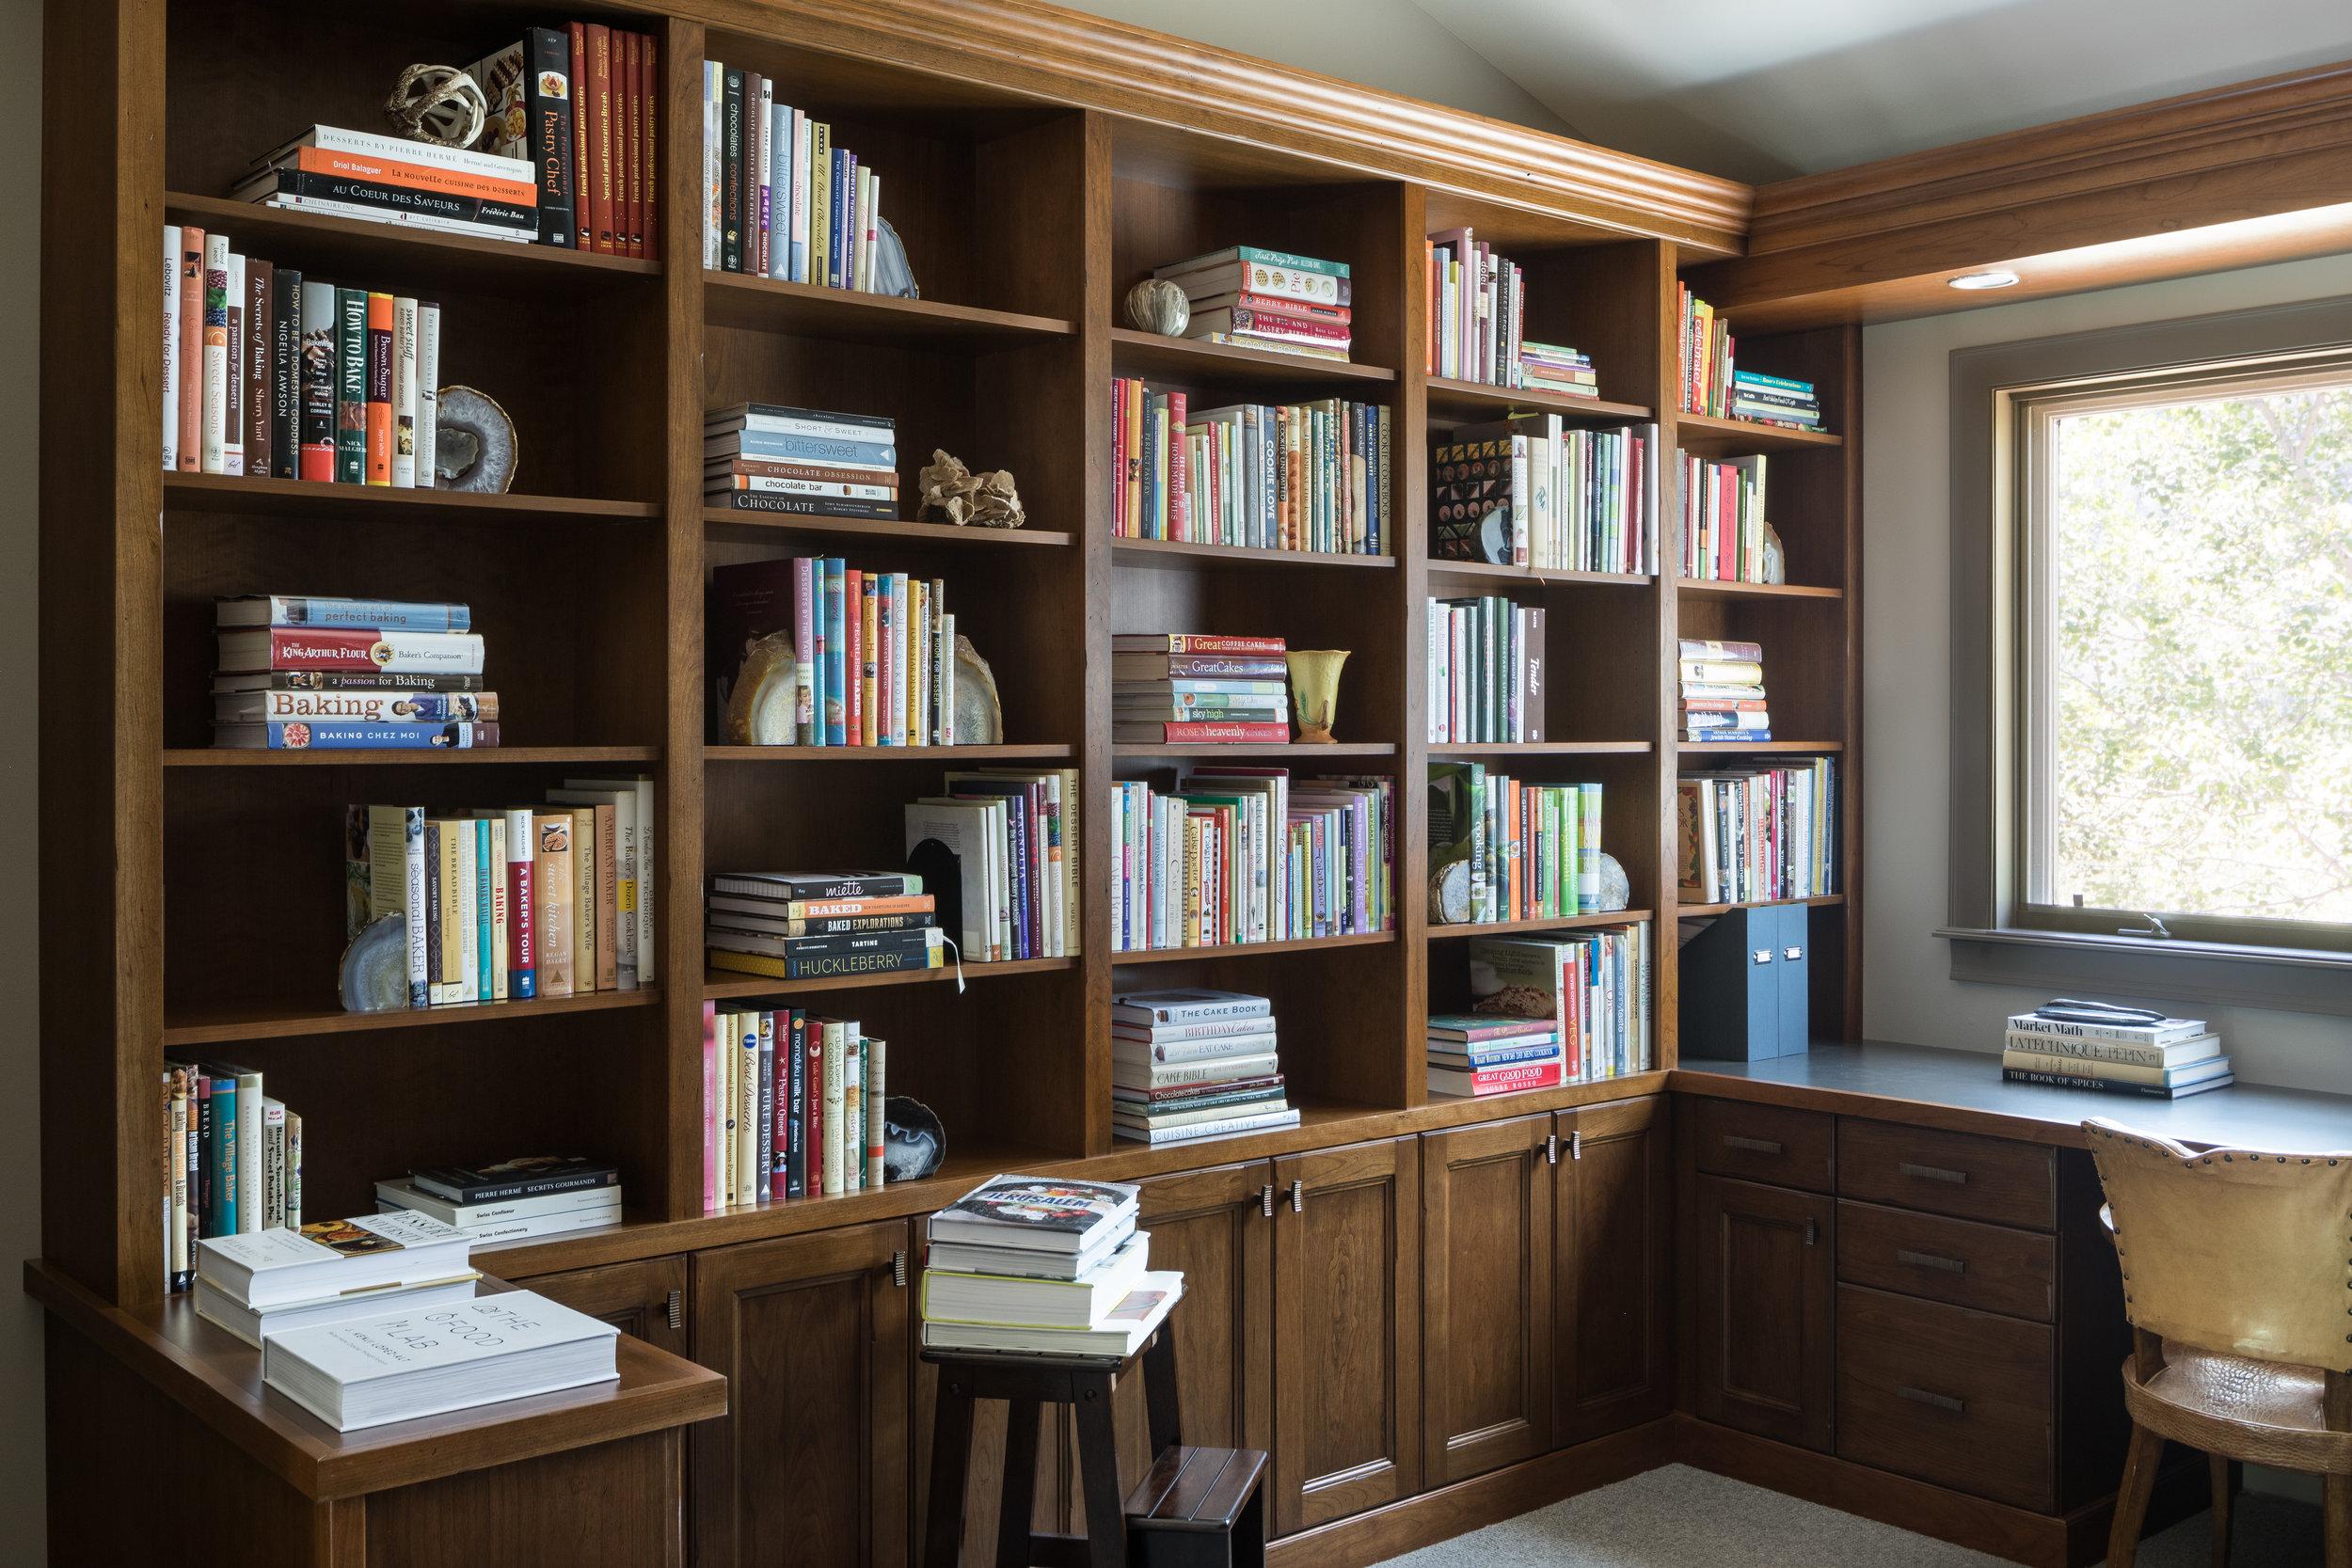 cookbooklibrary.jpg